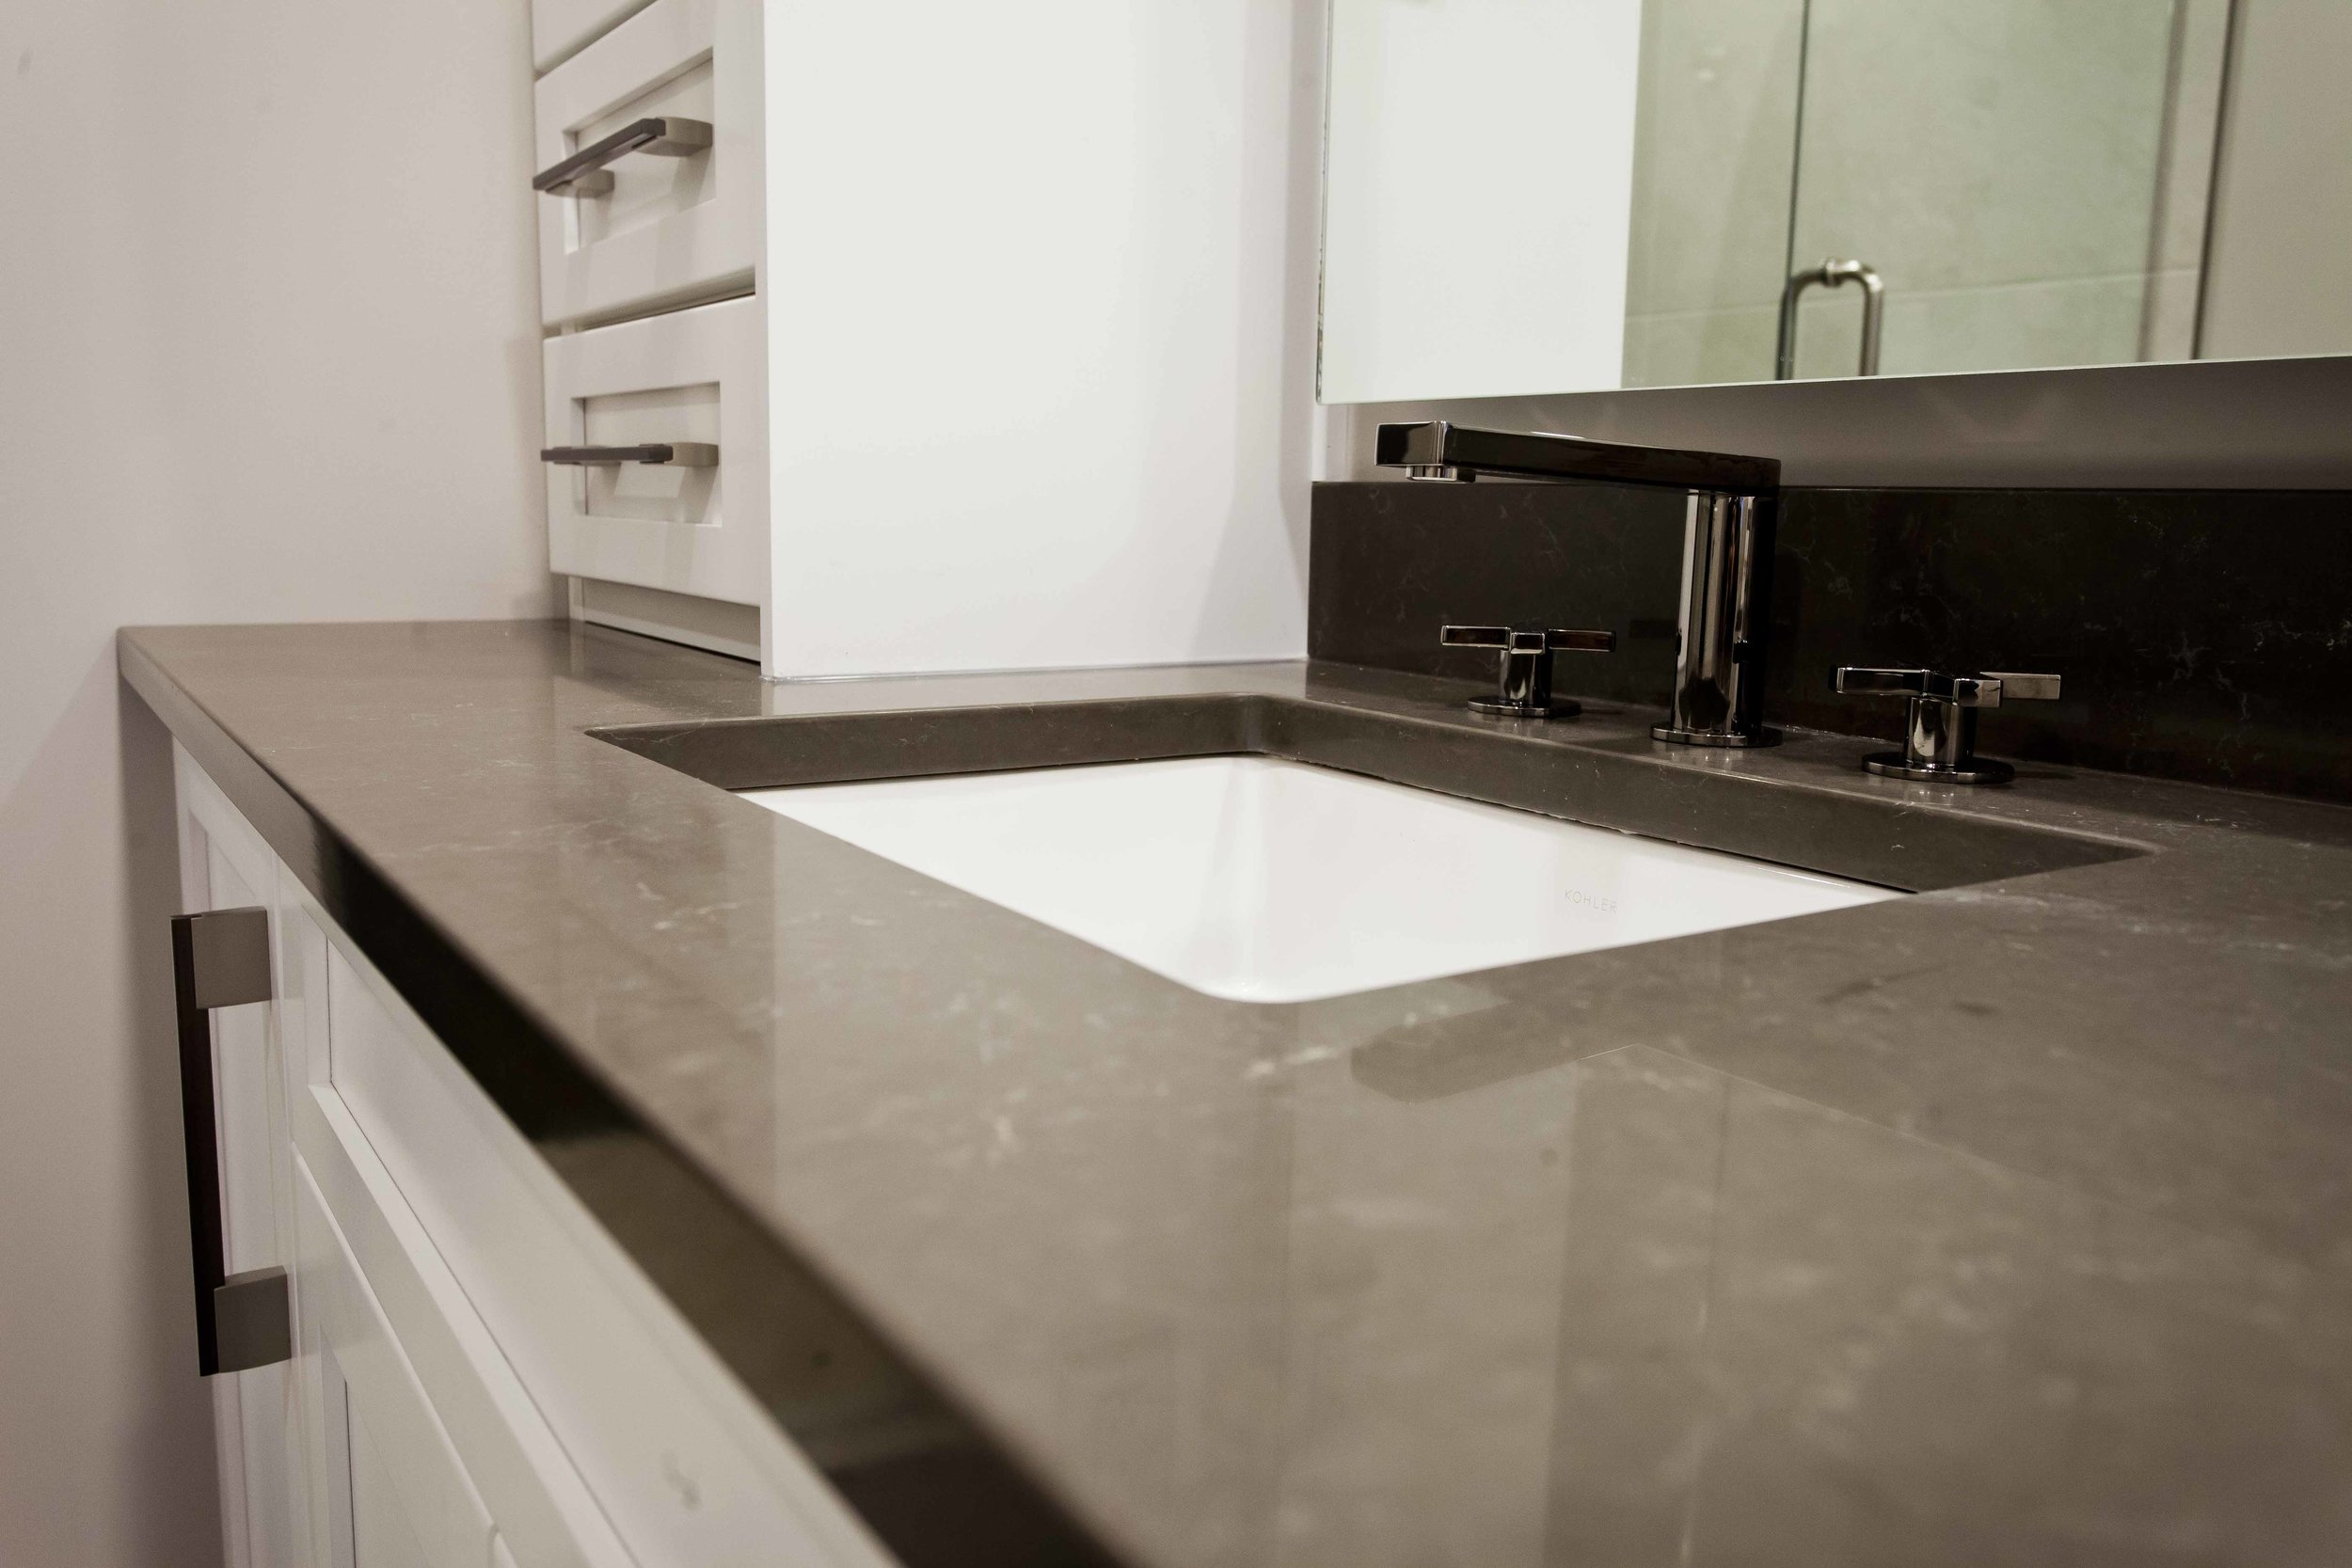 Workshop Cabinets & Design Camrose Alberta Interior Design Designer and Cabinetry Bathroom Design Master Bath